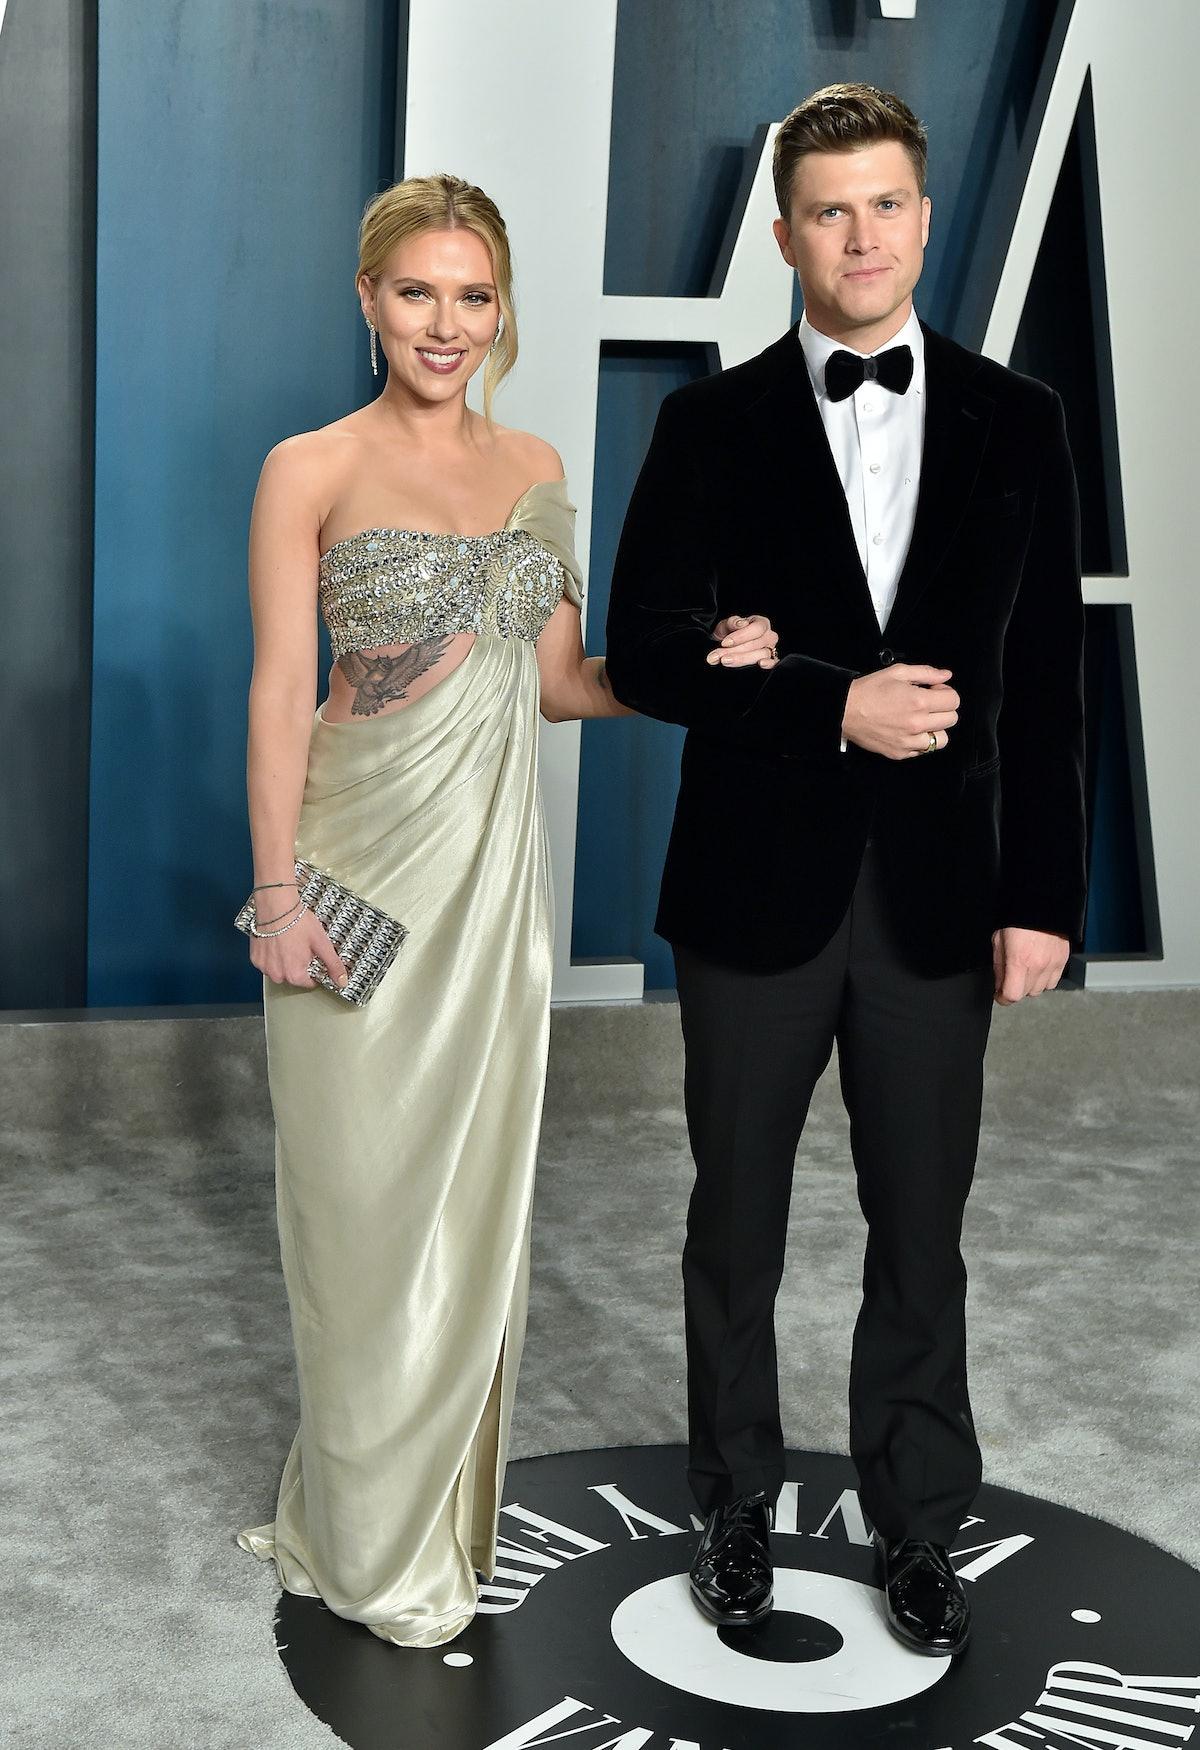 BEVERLY HILLS, CALIFORNIA - FEBRUARY 09: Scarlett Johansson and Colin Jost attend the 2020 Vanity Fa...